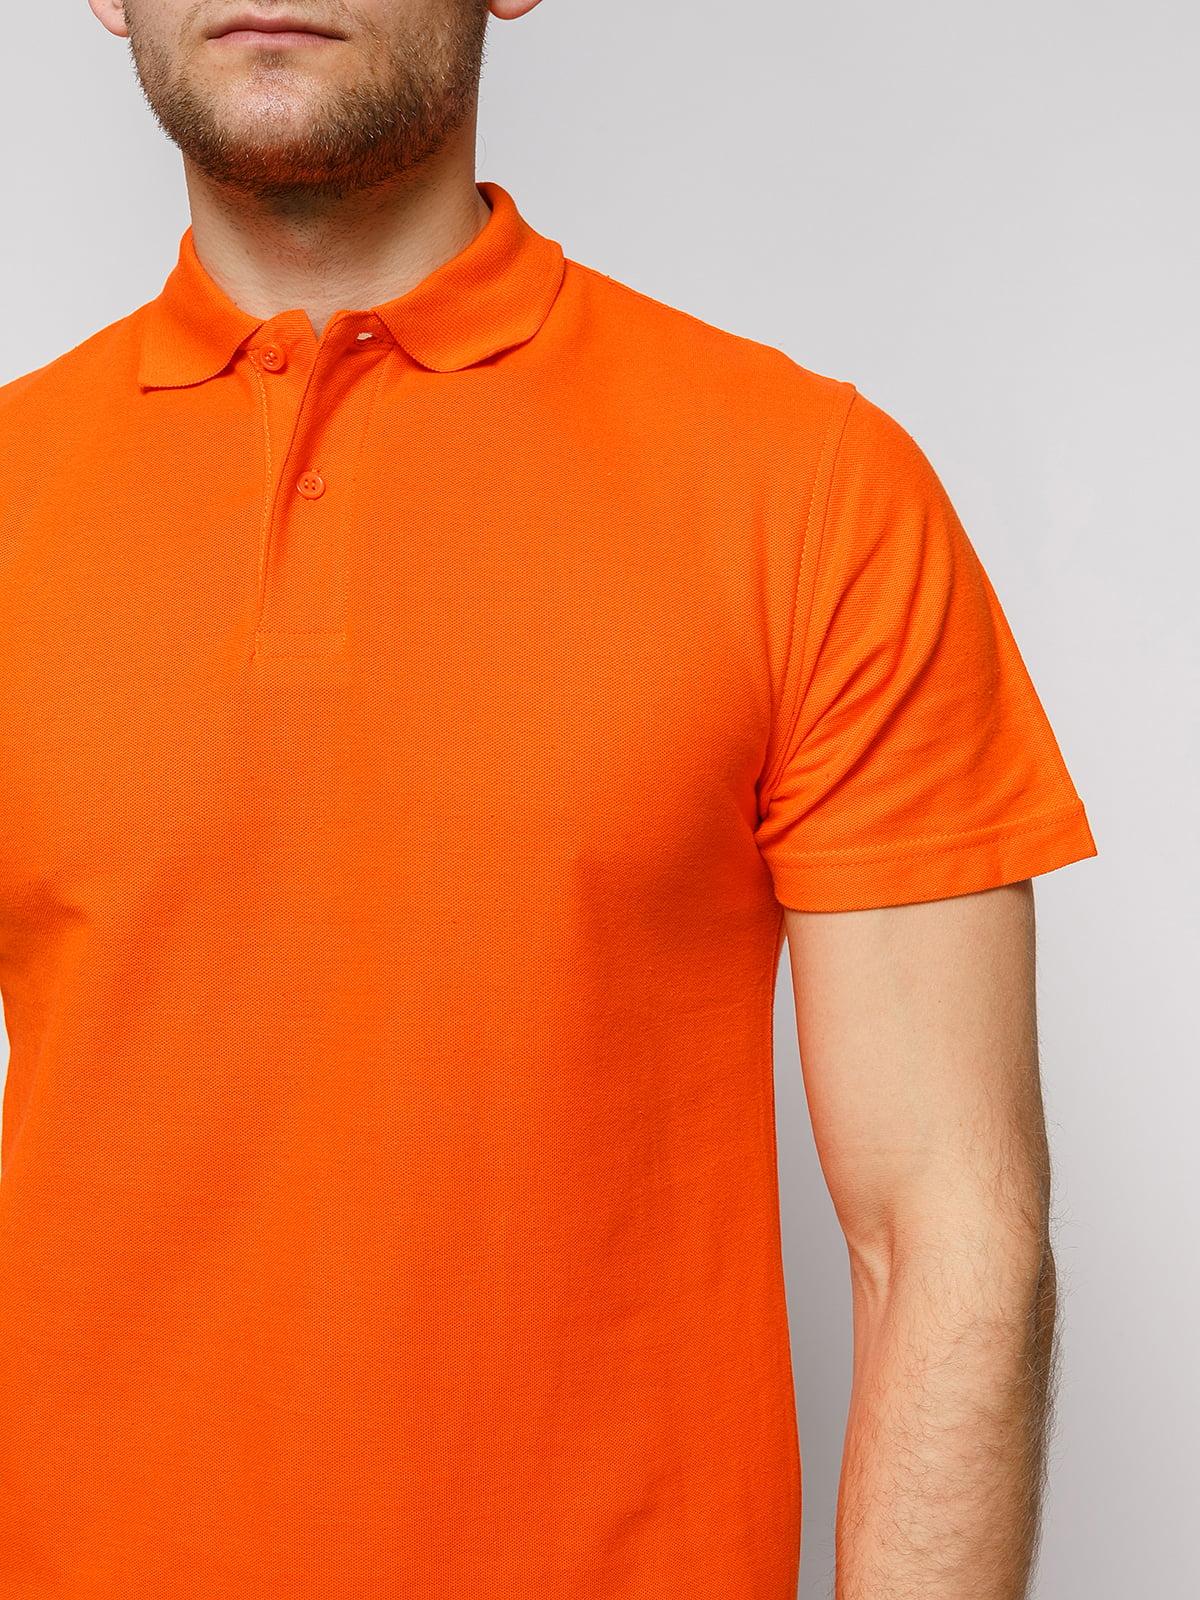 Футболка-поло оранжевая | 4812200 | фото 3